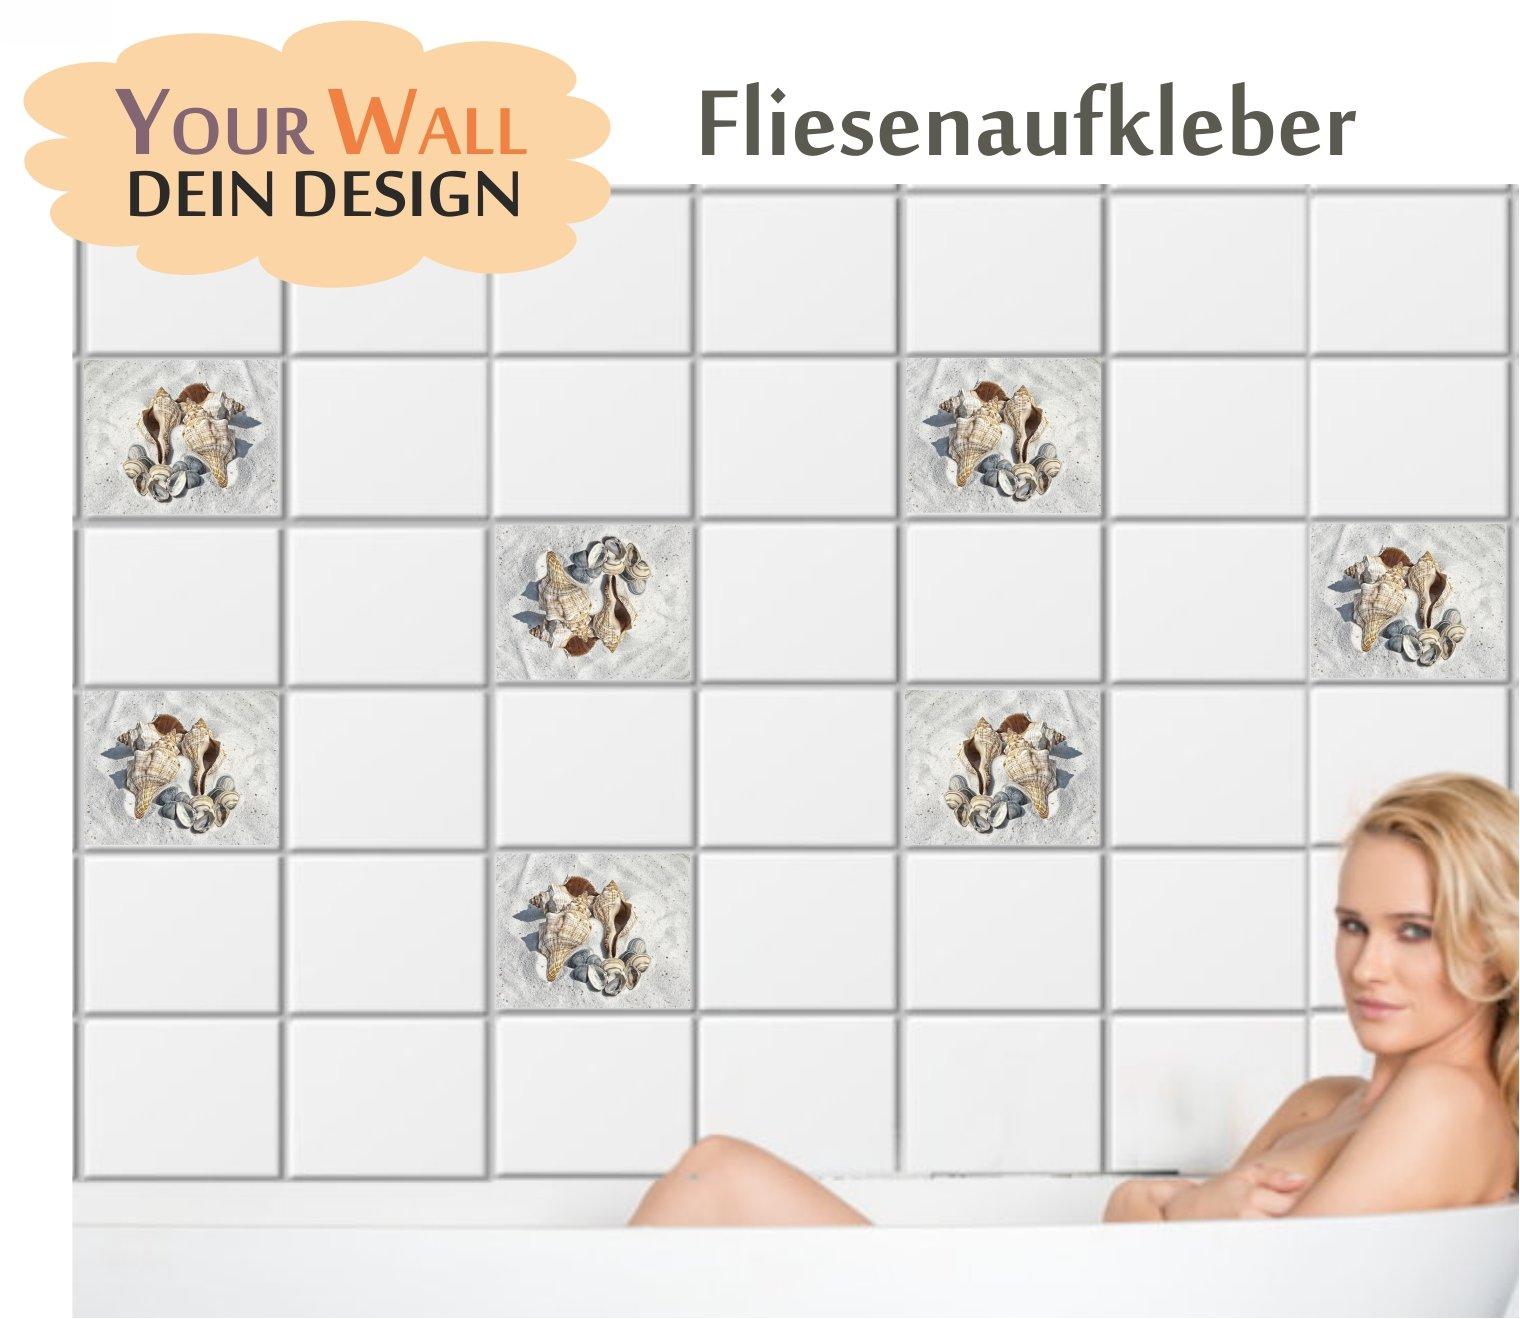 fliesenaufkleber muscheln fliesen sticker bad k che kachel natur sand b110 n ebay. Black Bedroom Furniture Sets. Home Design Ideas